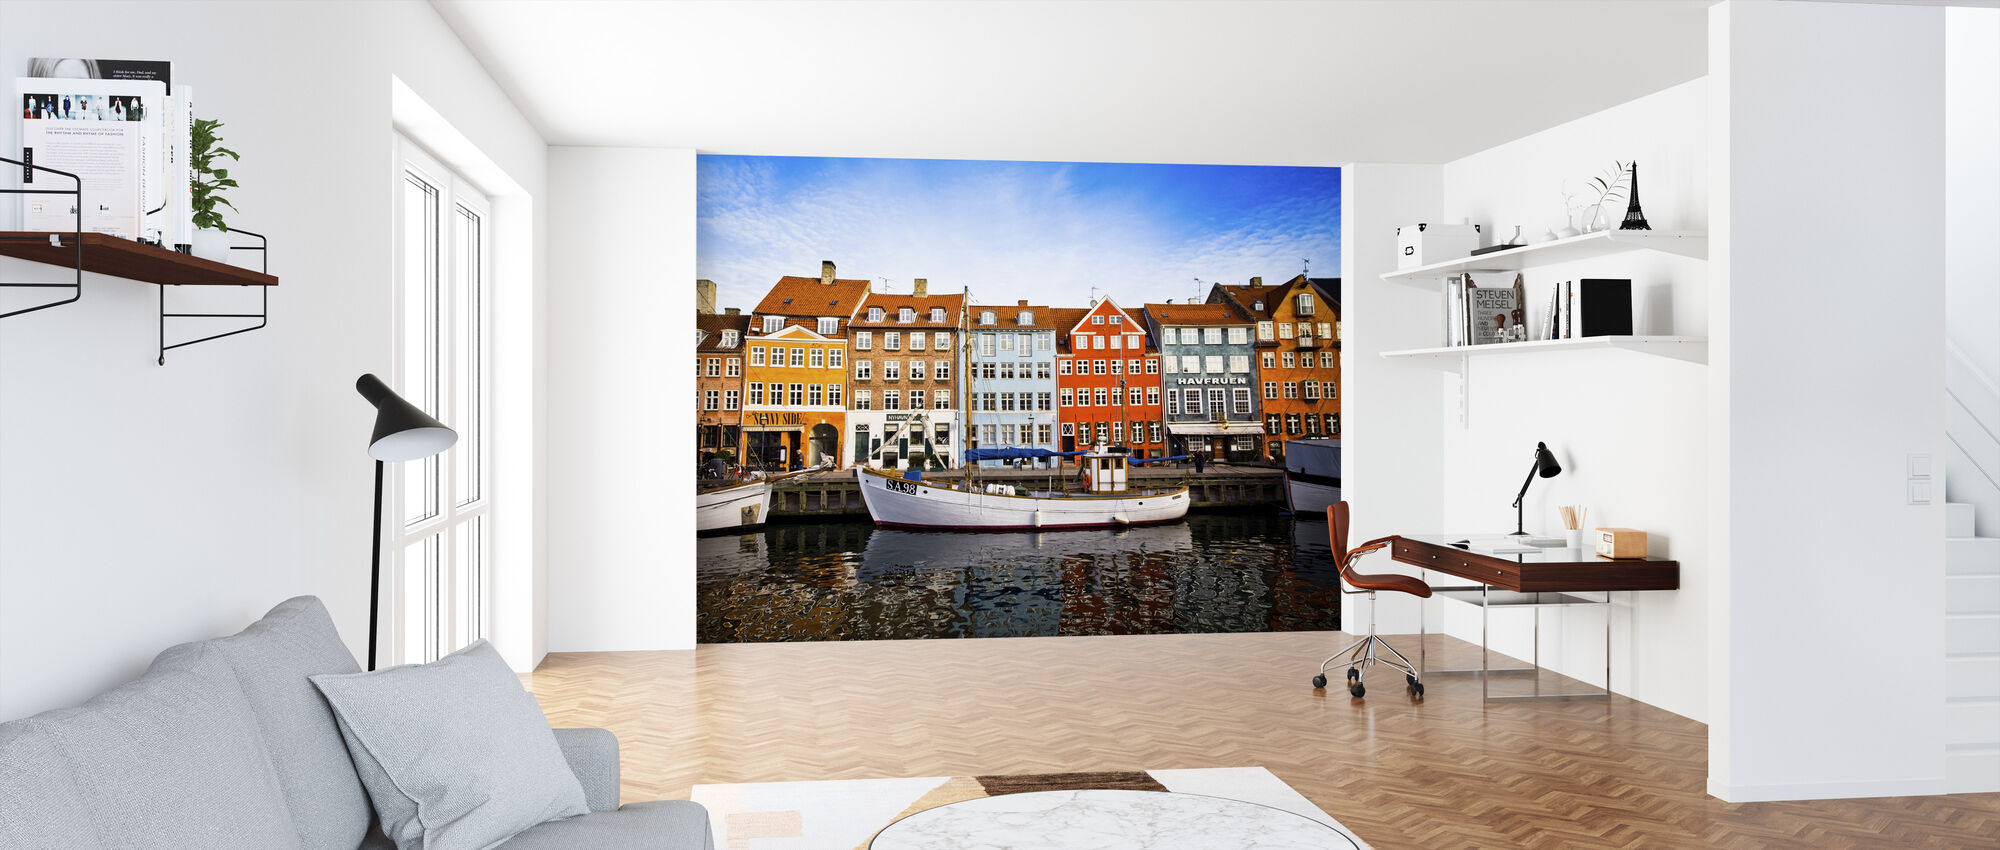 Boats in Nyhavn, Copenhagen, Denmark - Wallpaper - Office